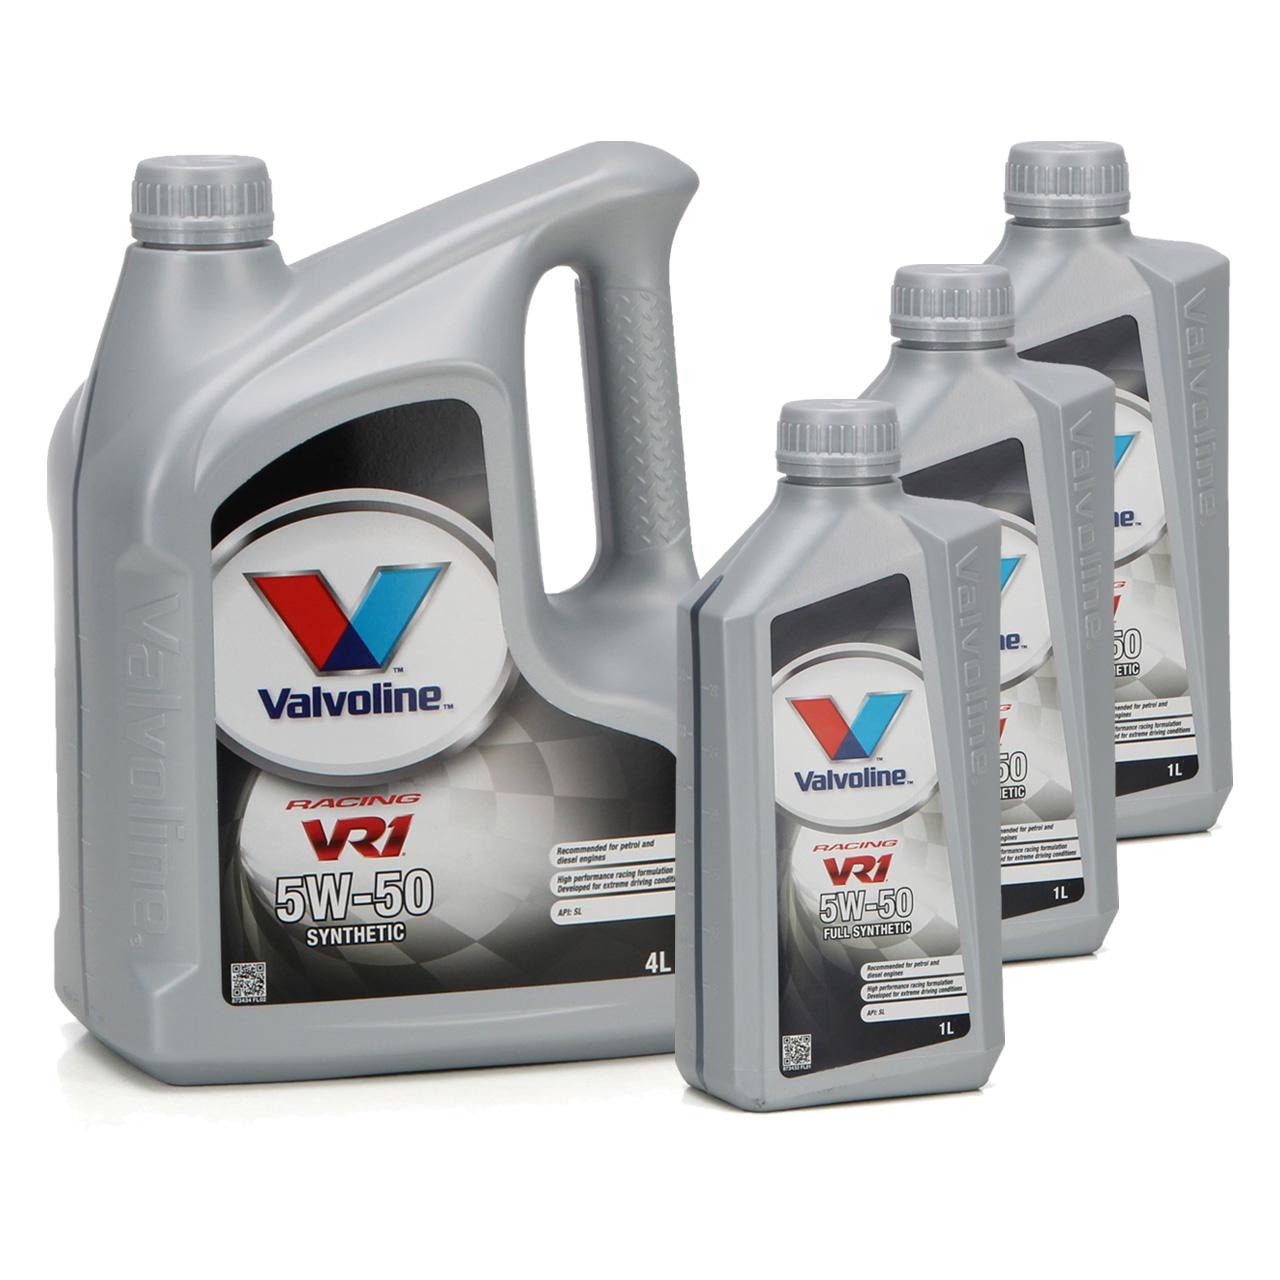 VALVOLINE Motoröl ÖL VR1 RACING 5W50 SM A3/B4 Ford M2C-153E GM 6094M - 7 Liter